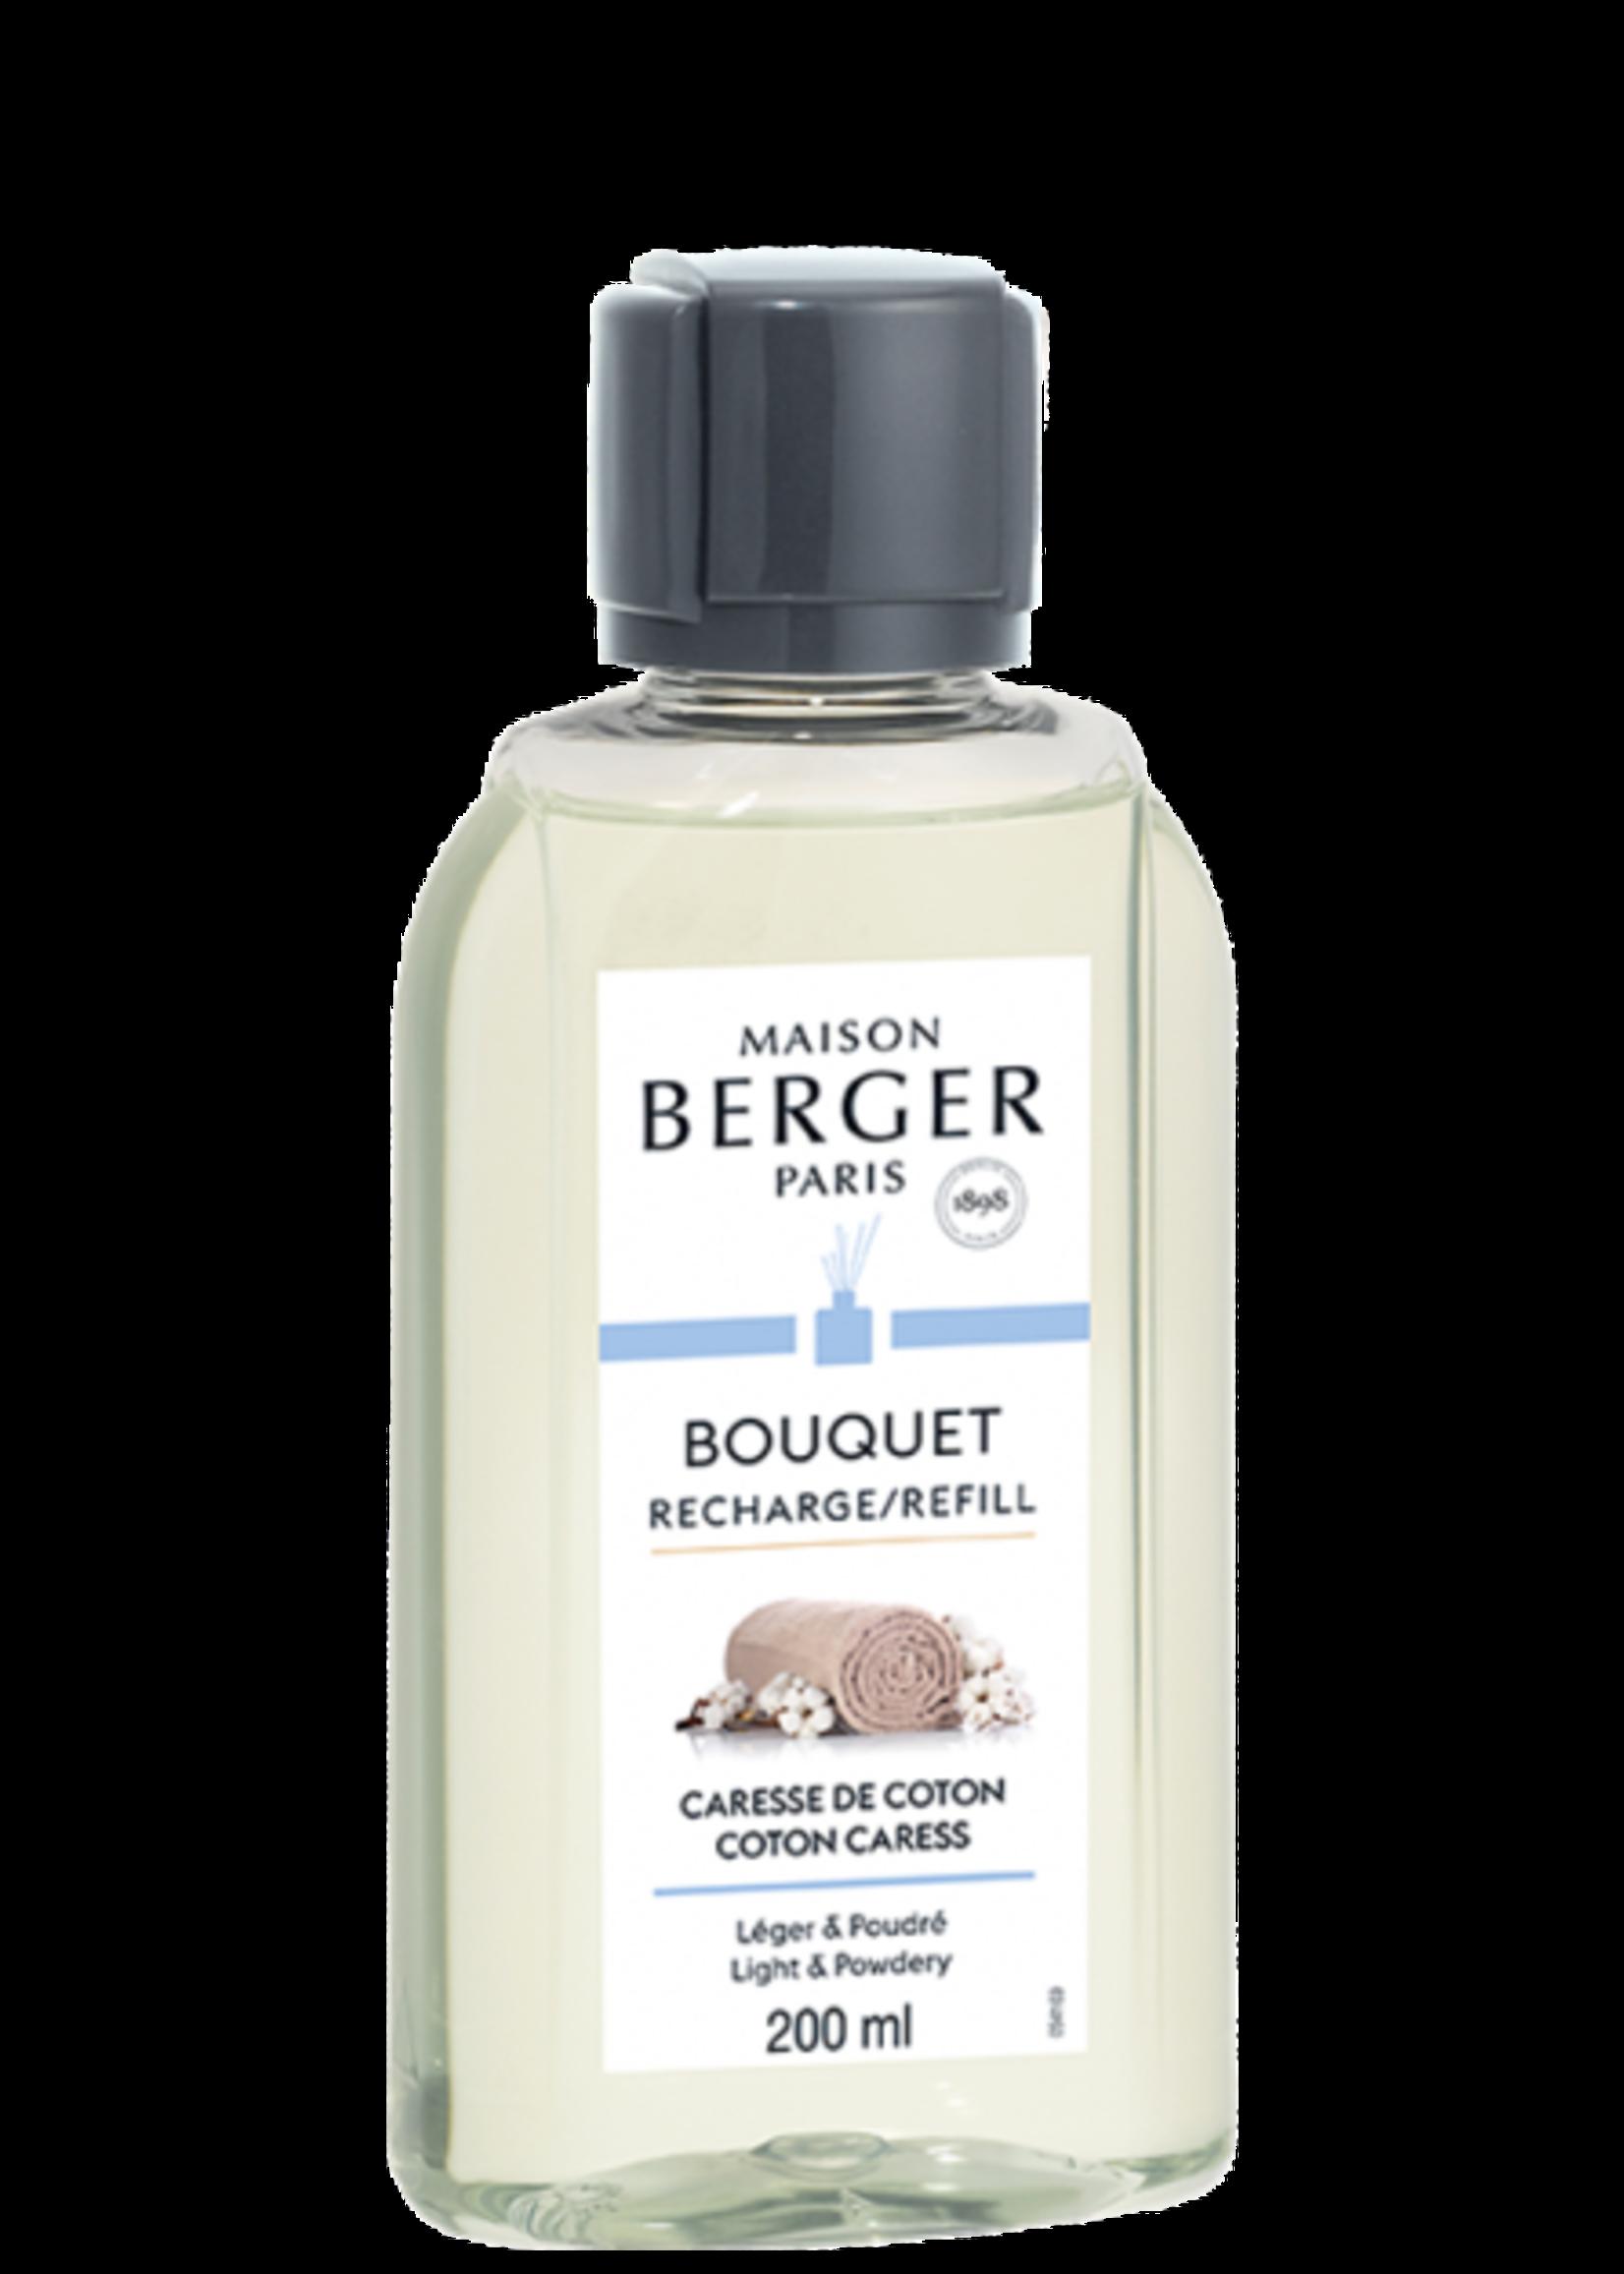 Parfum de Berger Navulling 200ml Parfumverspreider Caresse de Coton